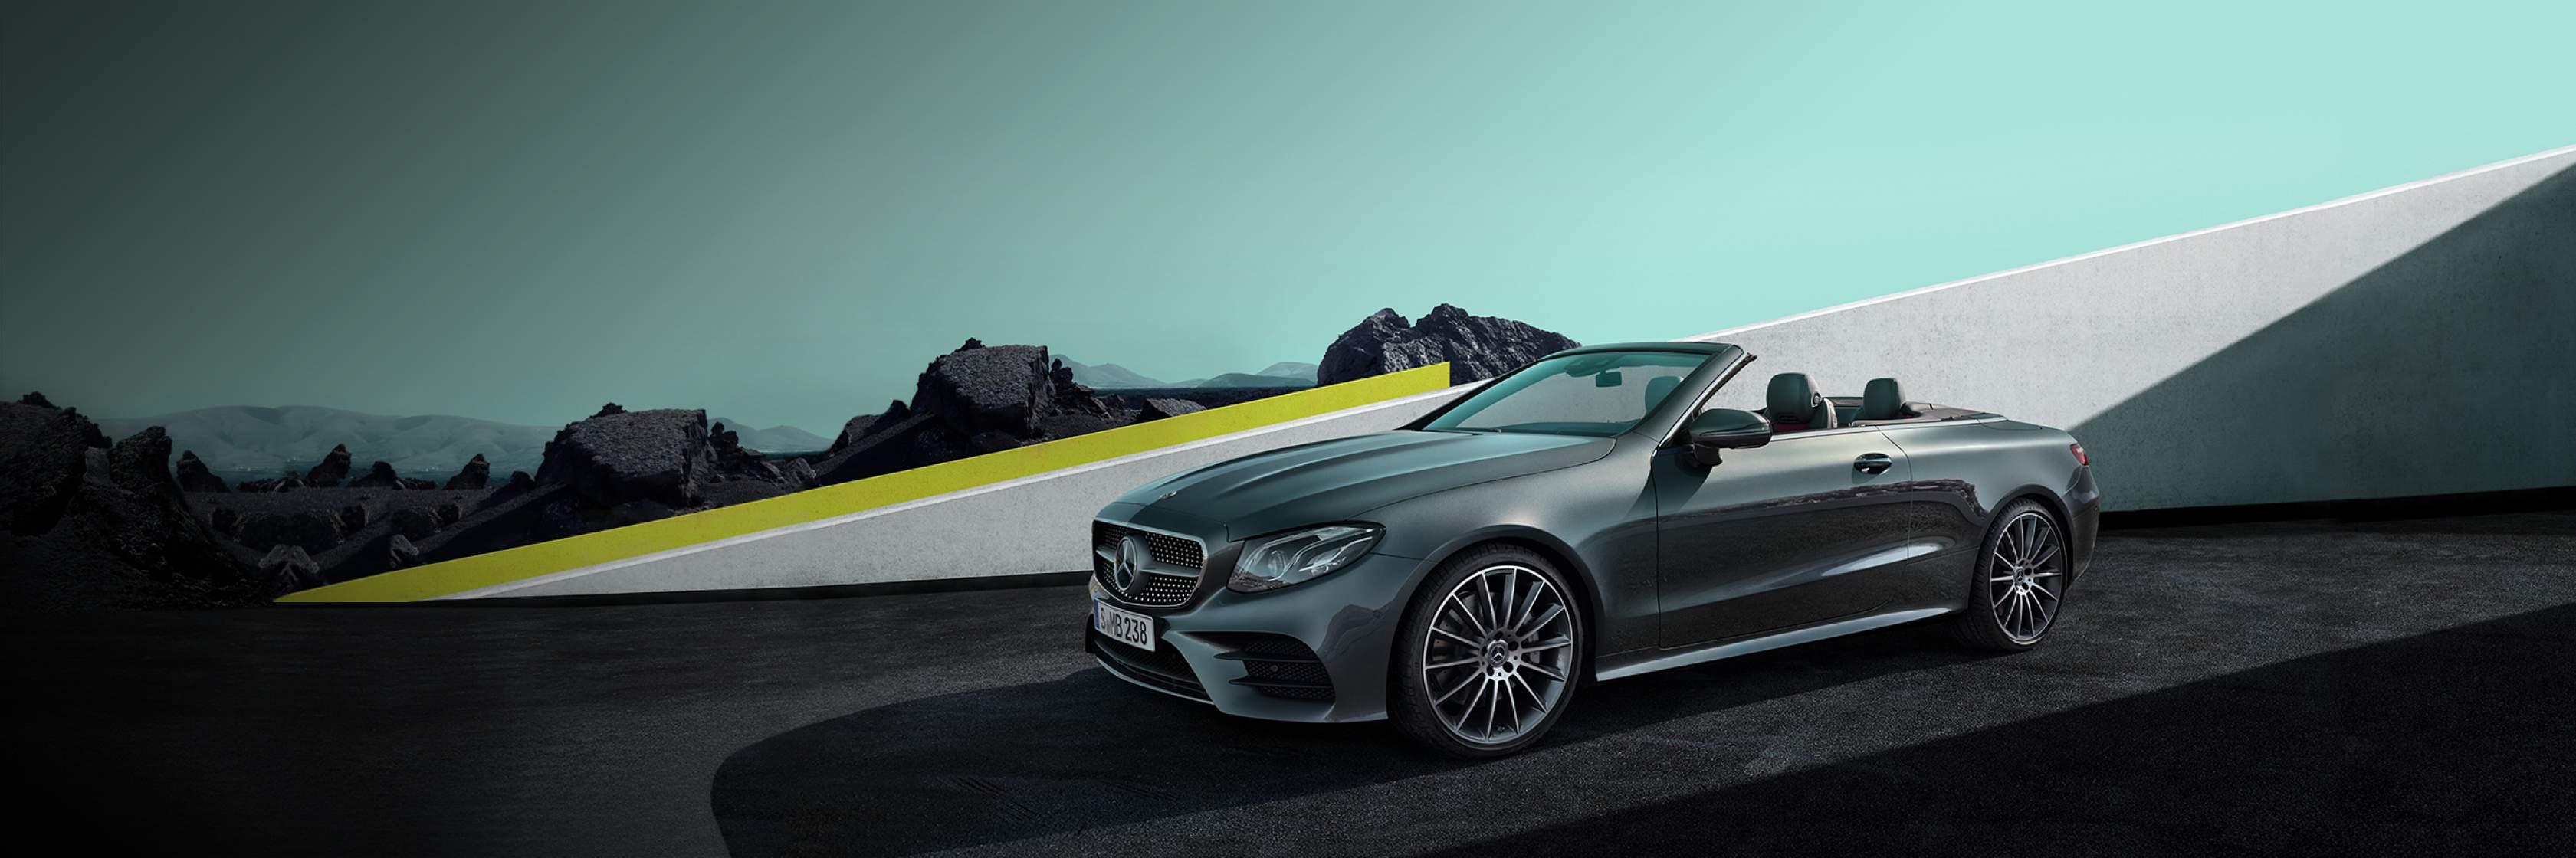 Интерьер и экстерьер Mercedes–Benz E–Class Cabriolet